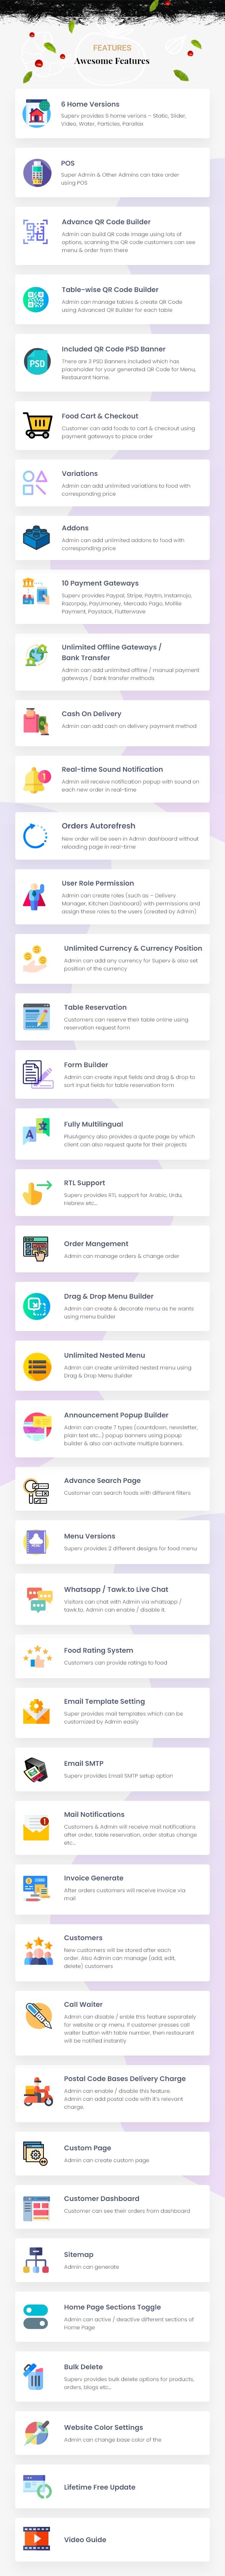 Superv - Restaurant Website Management with QR Code Menu - 4